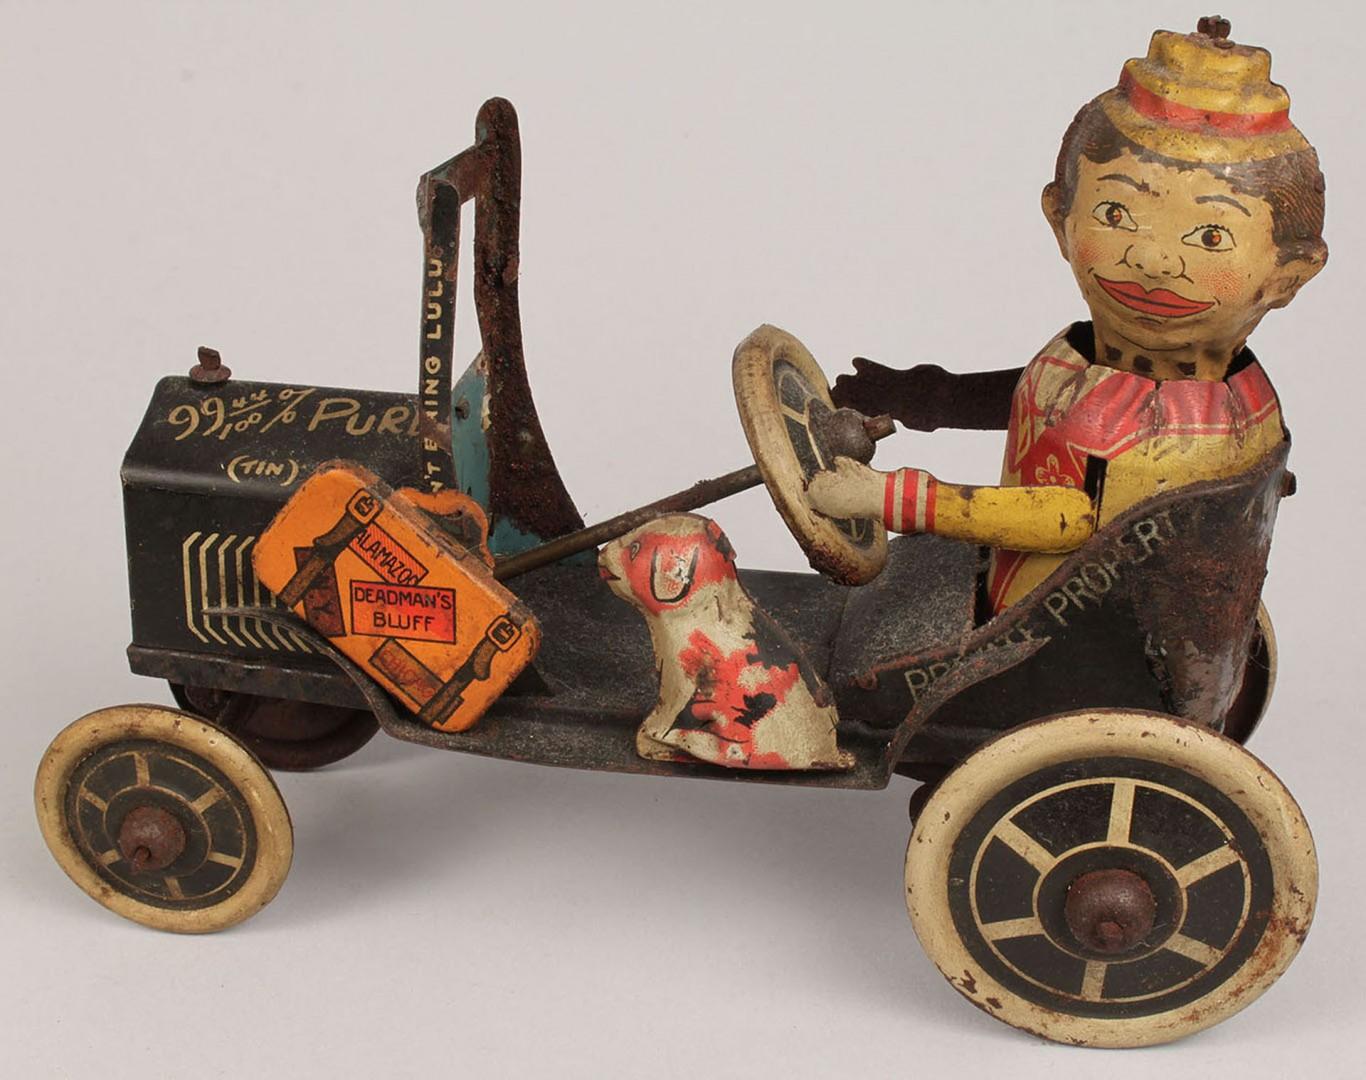 Lot 2872359: 2 Marx Tin Wind-Up Toys, Car & Plane